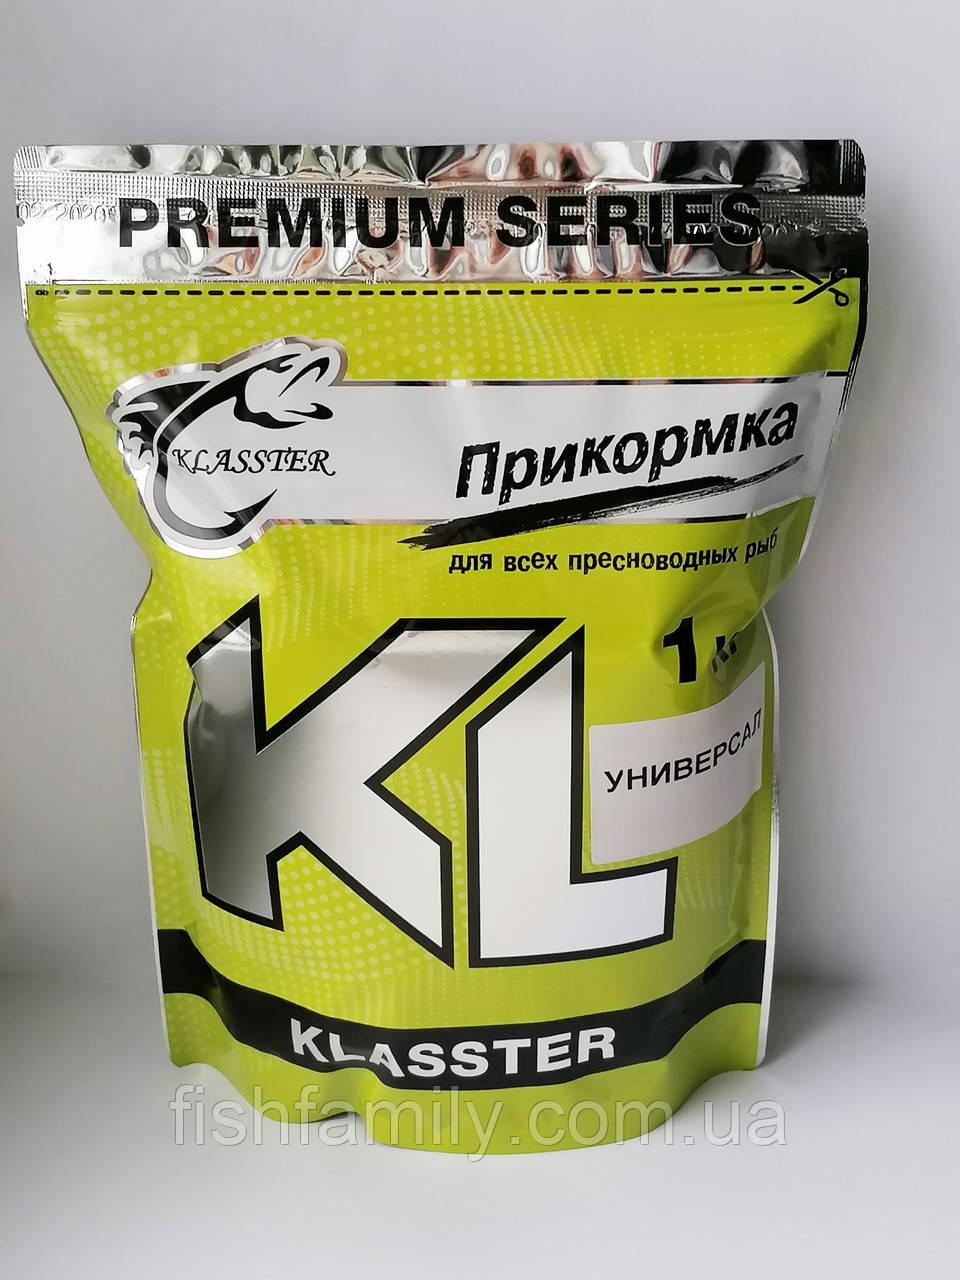 Прикормка Klasster Premium Универсал 1 кг